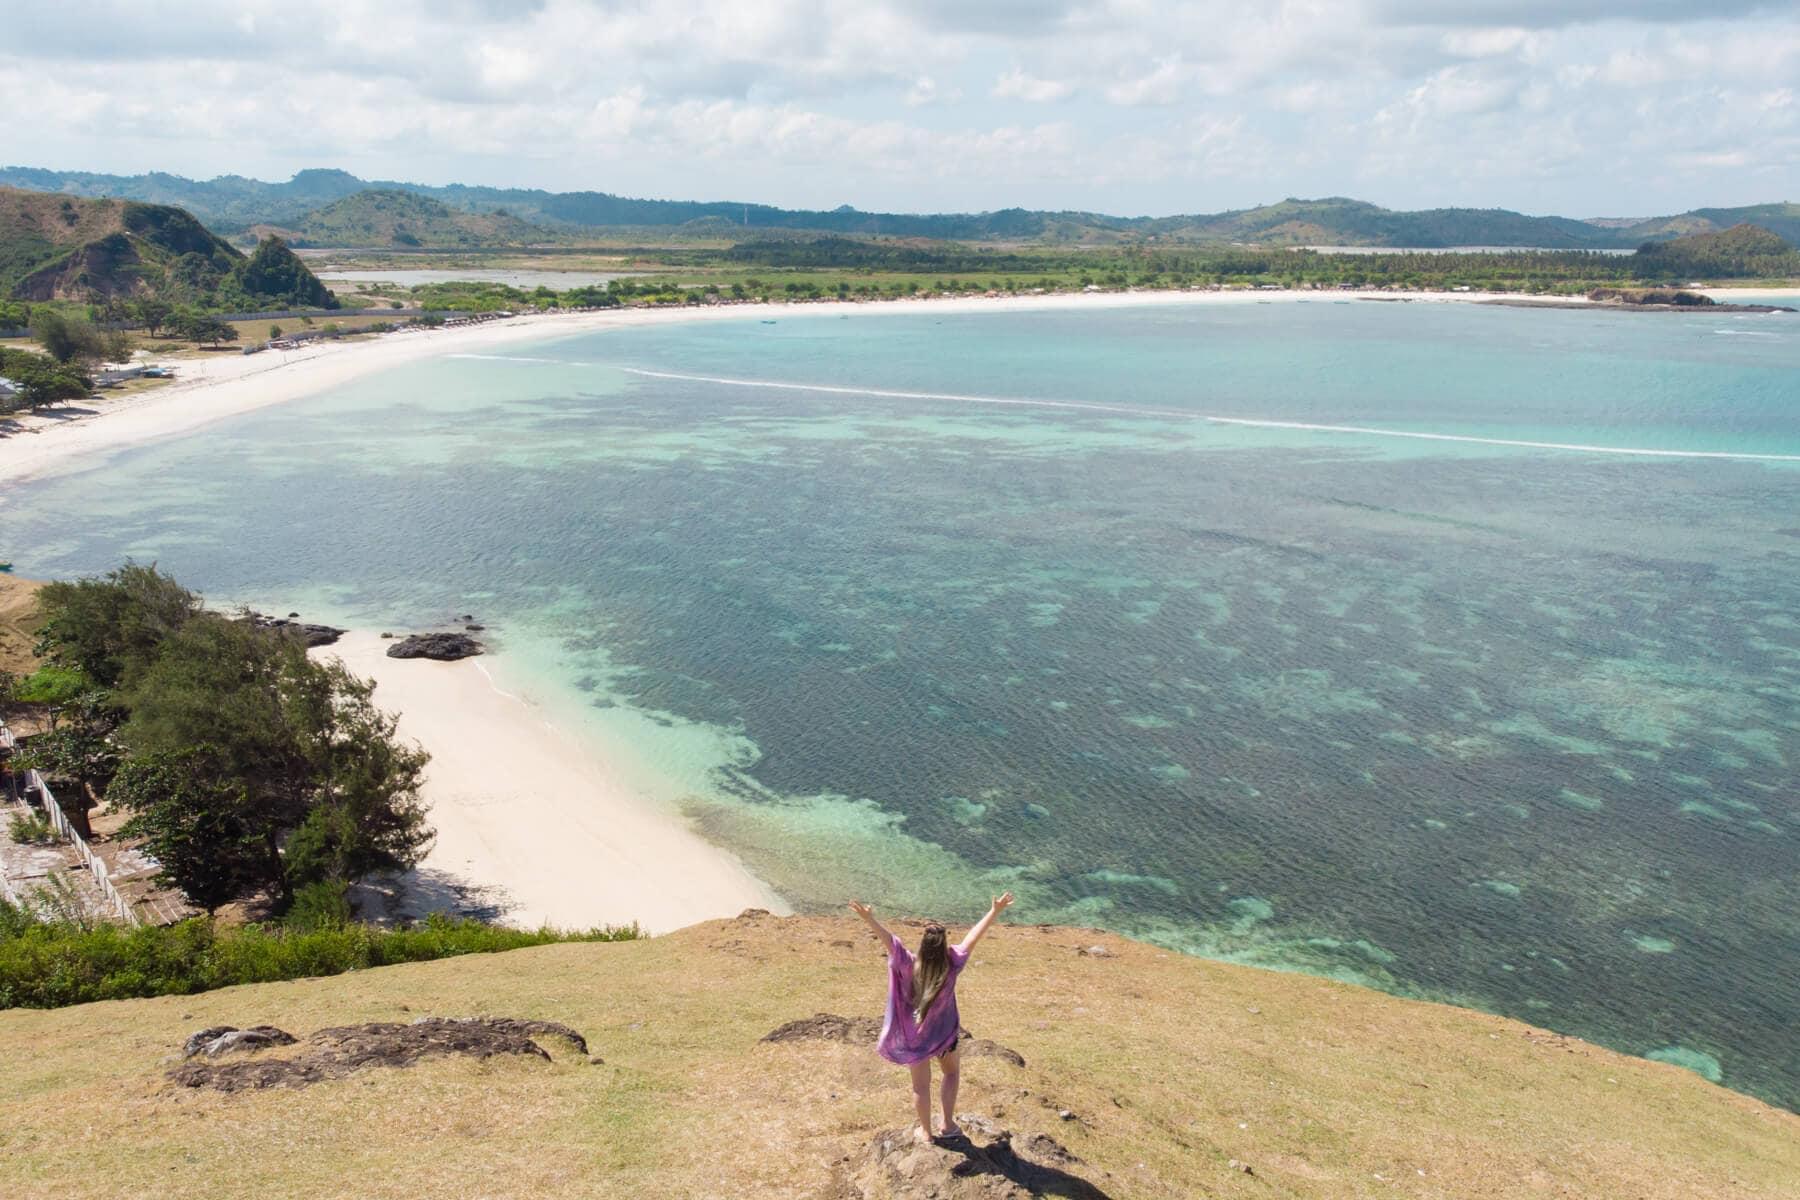 5 of the best views close to Kuta, Lombok - View from Bukit Merese looking towards Tanjung Aan Beach